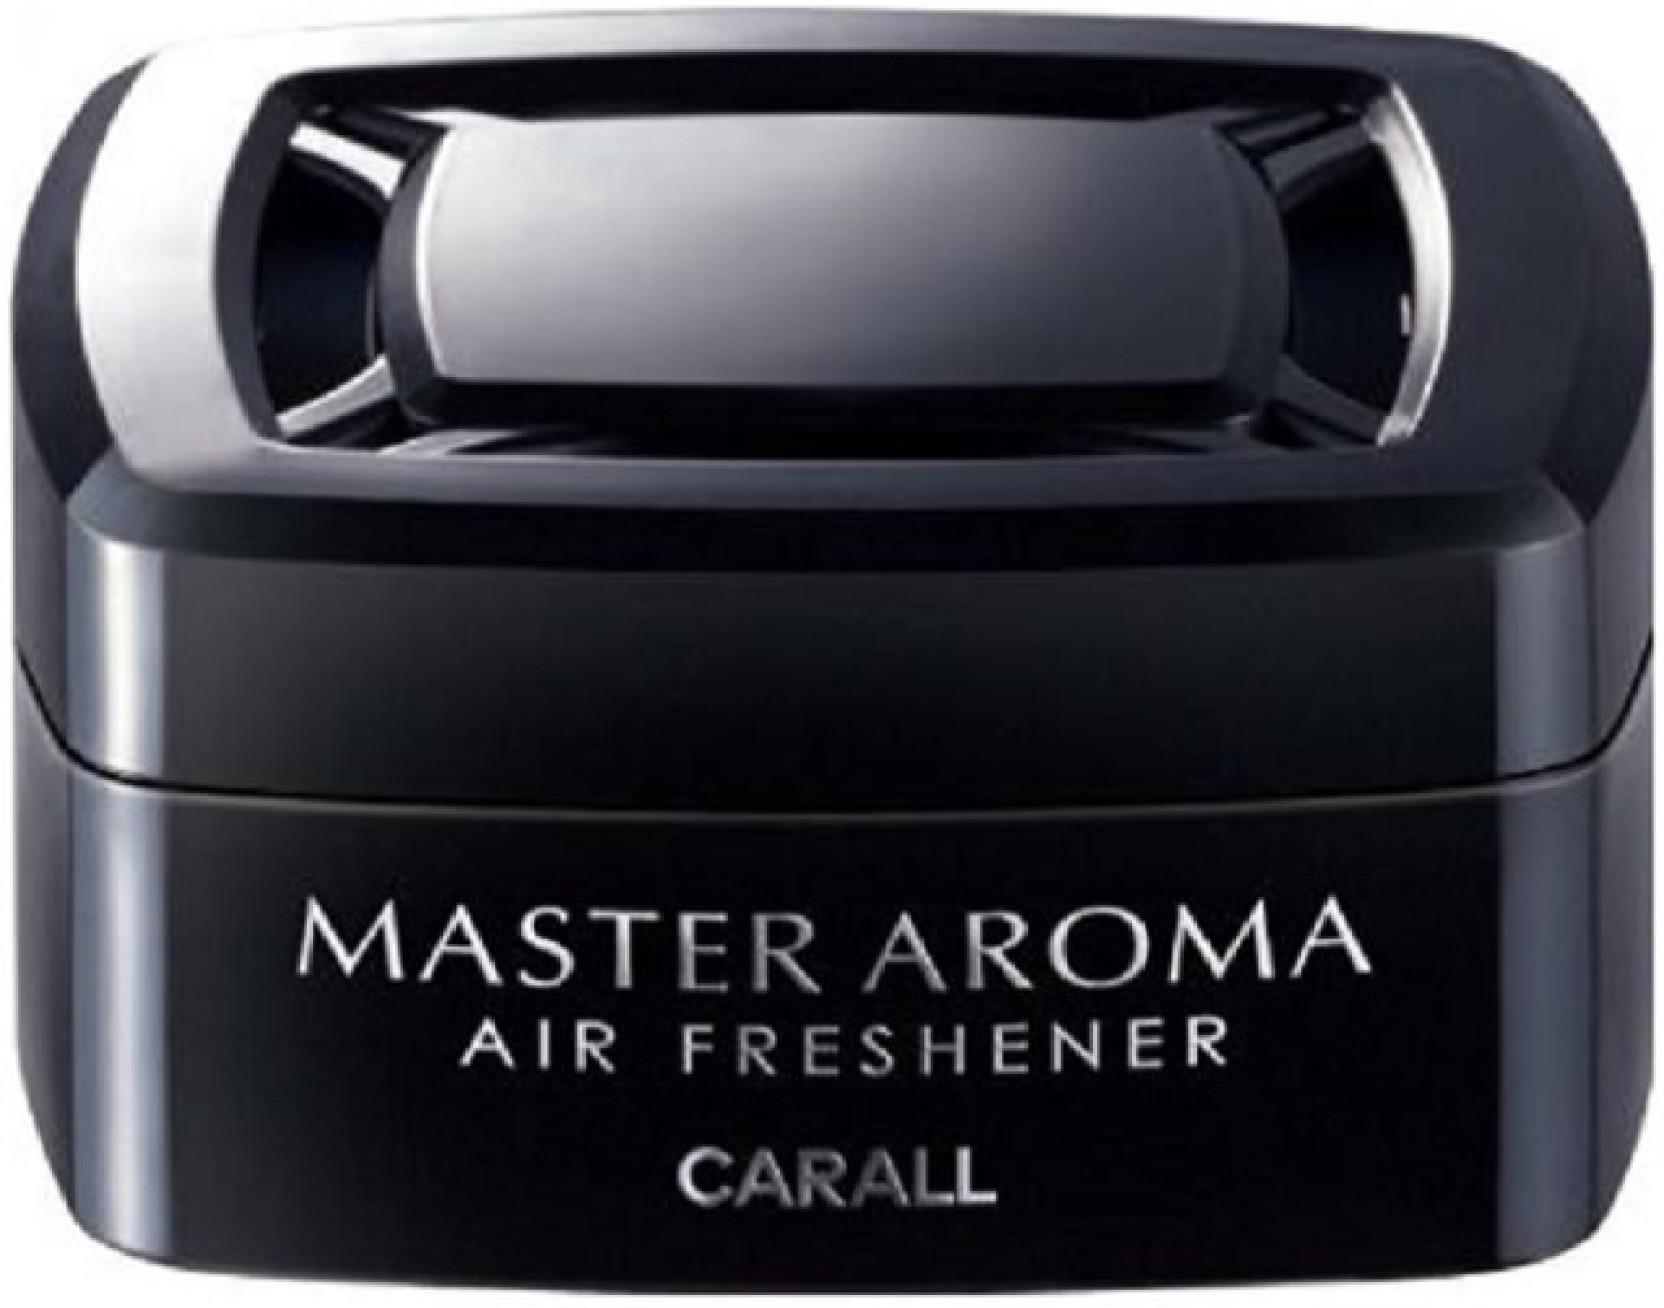 Vibex Master Aroma Gel Type Air Freshener Squash Scent 1859squash Spray Cologne Black Musk On Offer